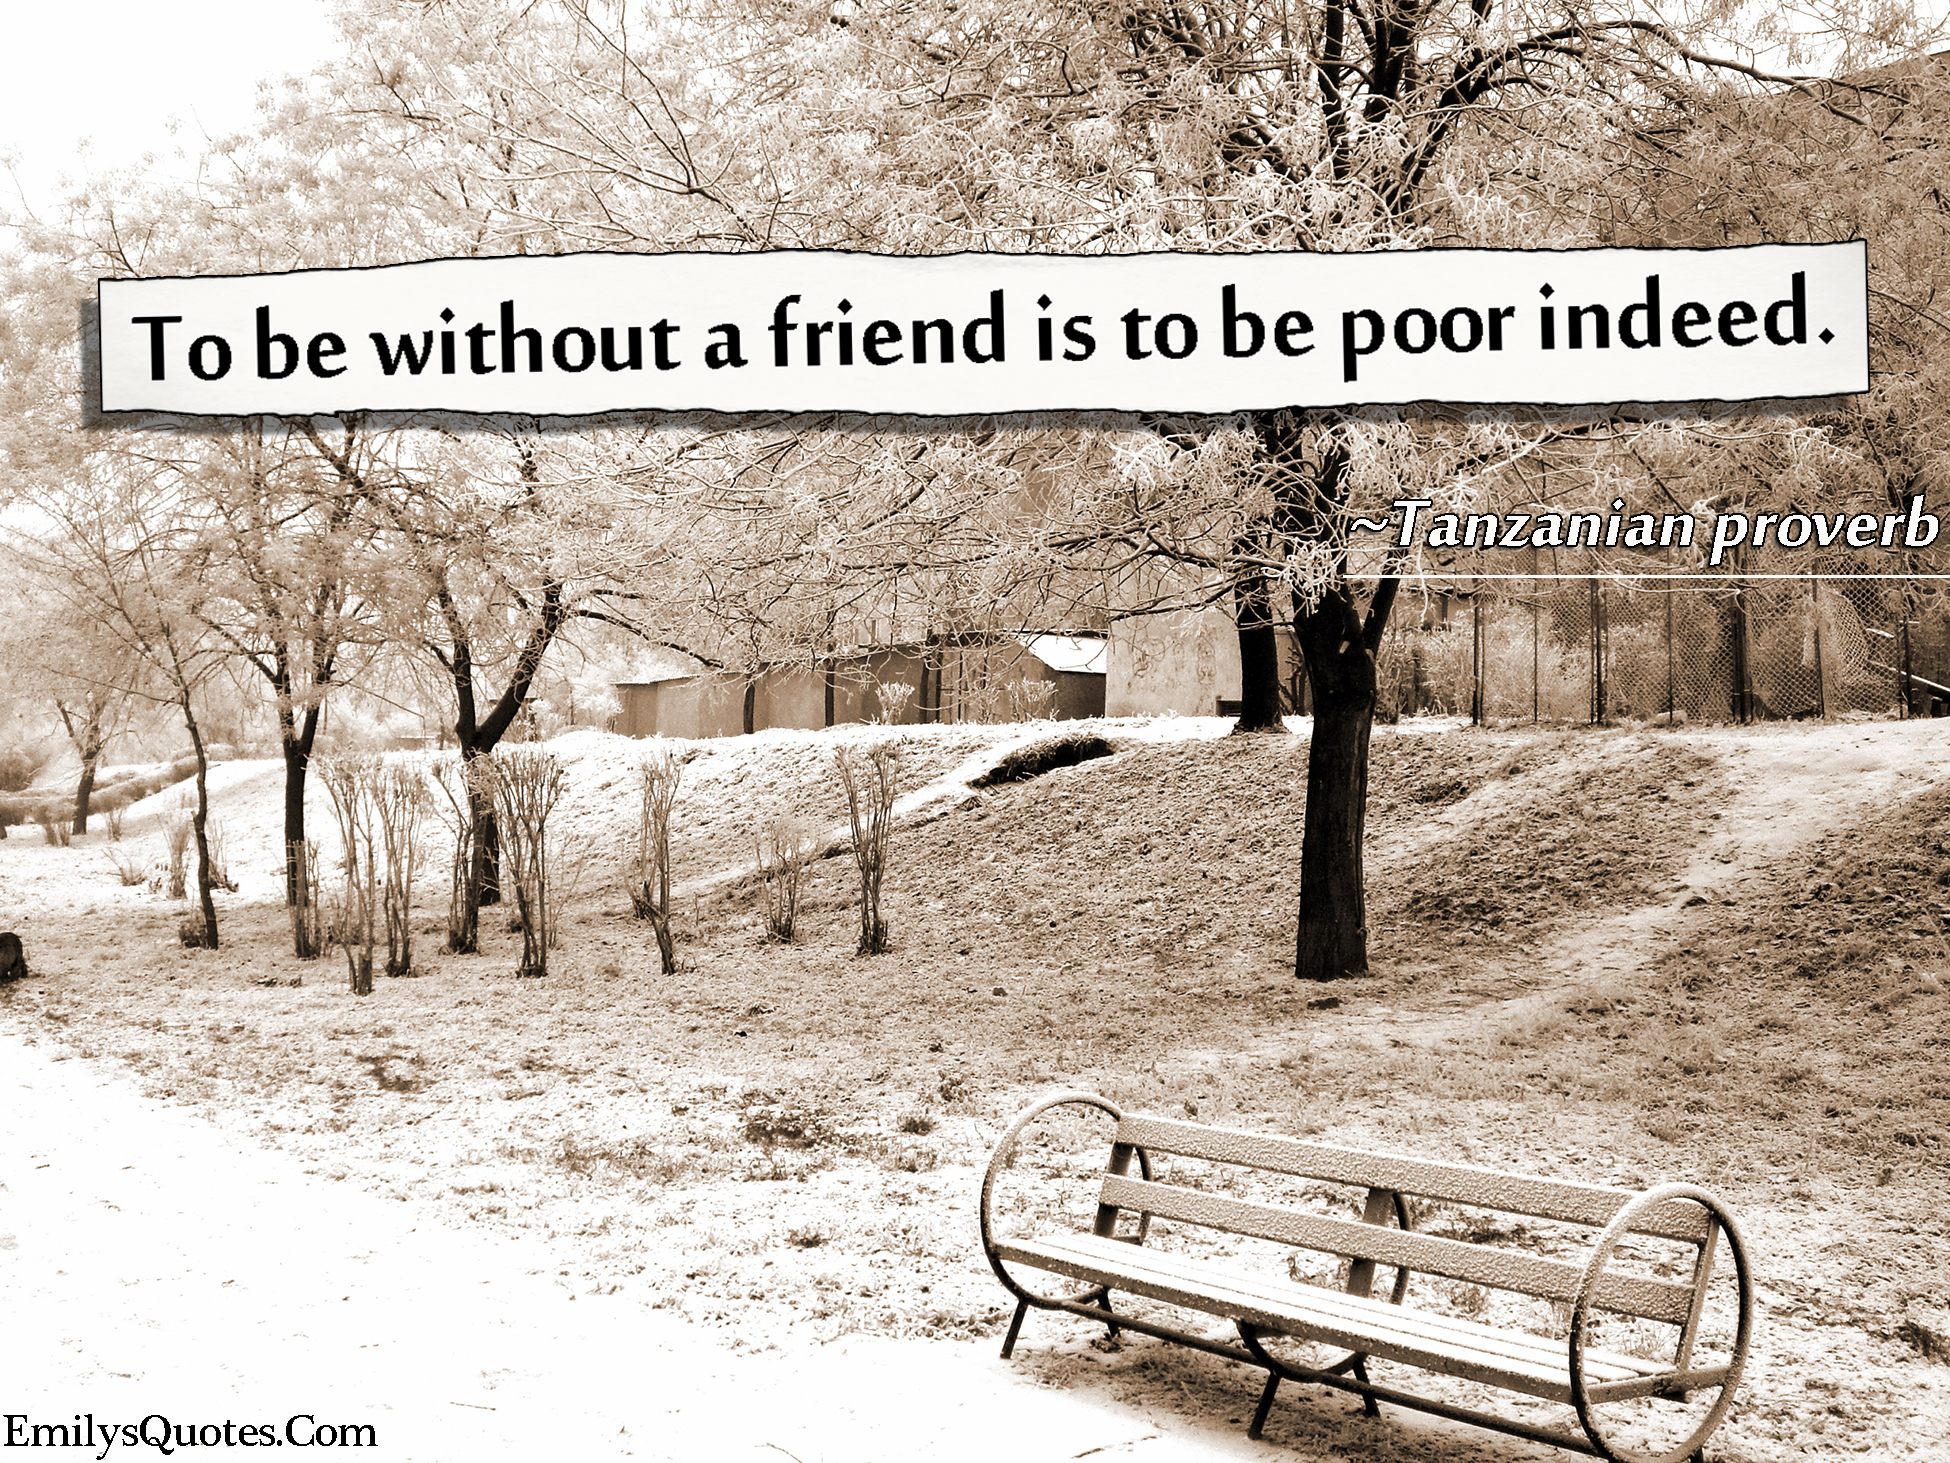 EmilysQuotes.Com - poor, sad, friendship, Tanzanian proverb